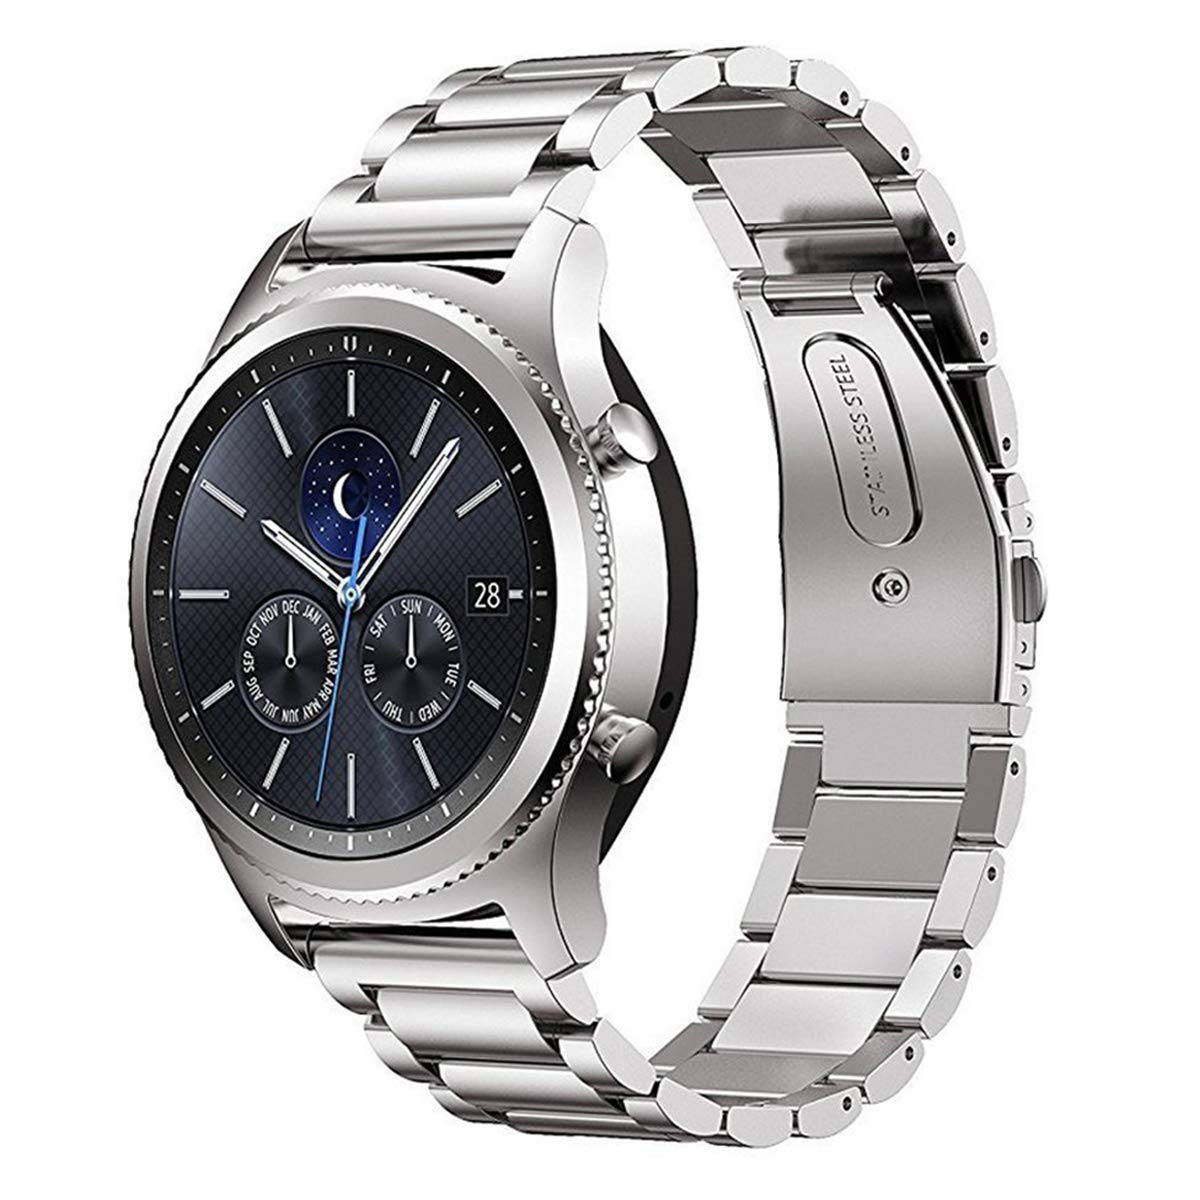 MroTech Correa Gear S3 Classic/Galaxy Watch 46mm 22mm Sólido de Acero Inoxidable Metal Band Compatible para Samsung Gear S3 Smartwatch y Huawei Watch ...